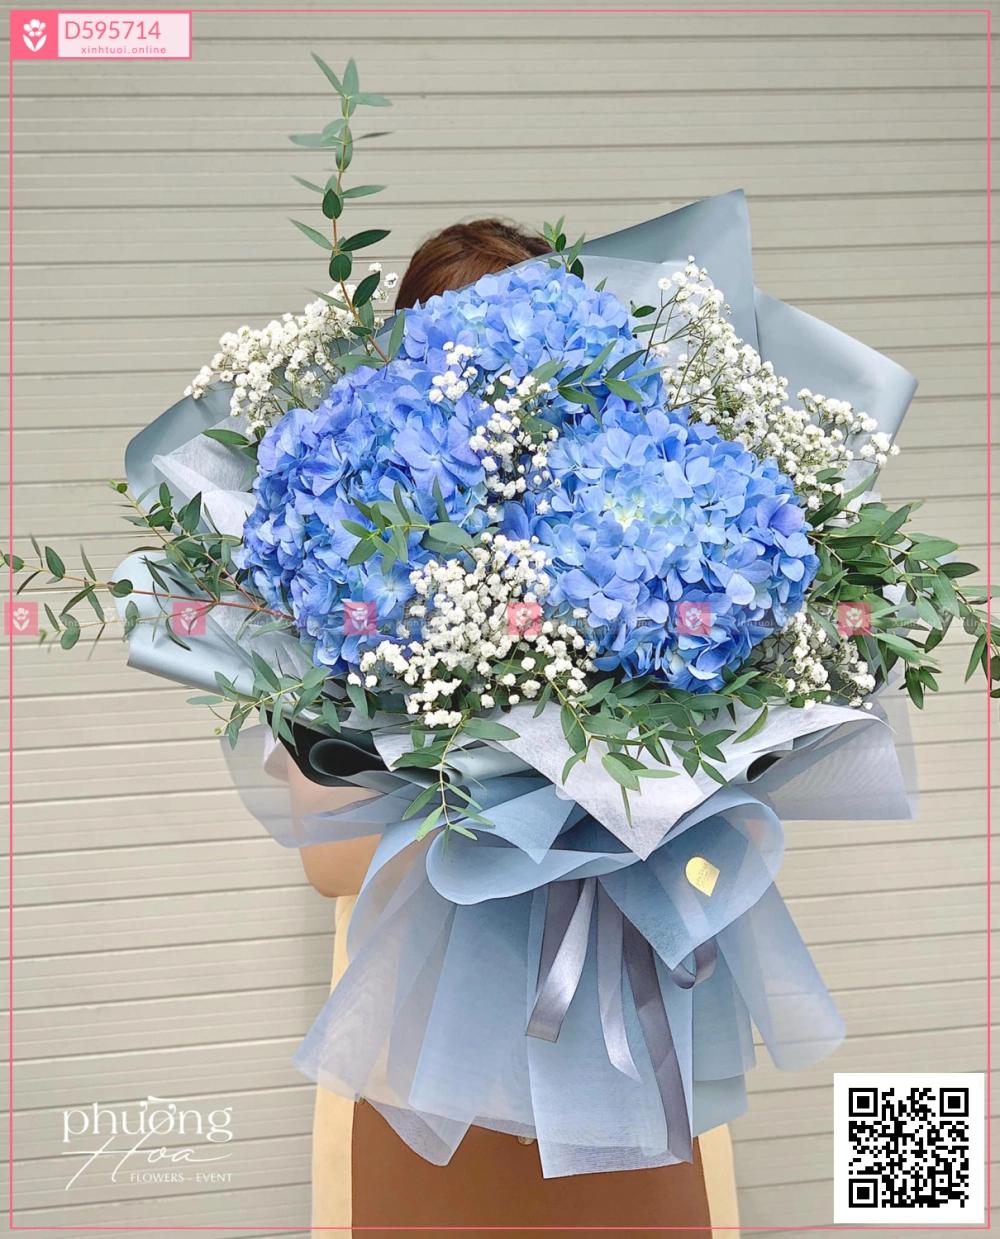 Ngọt ngào - D595714 - xinhtuoi.online